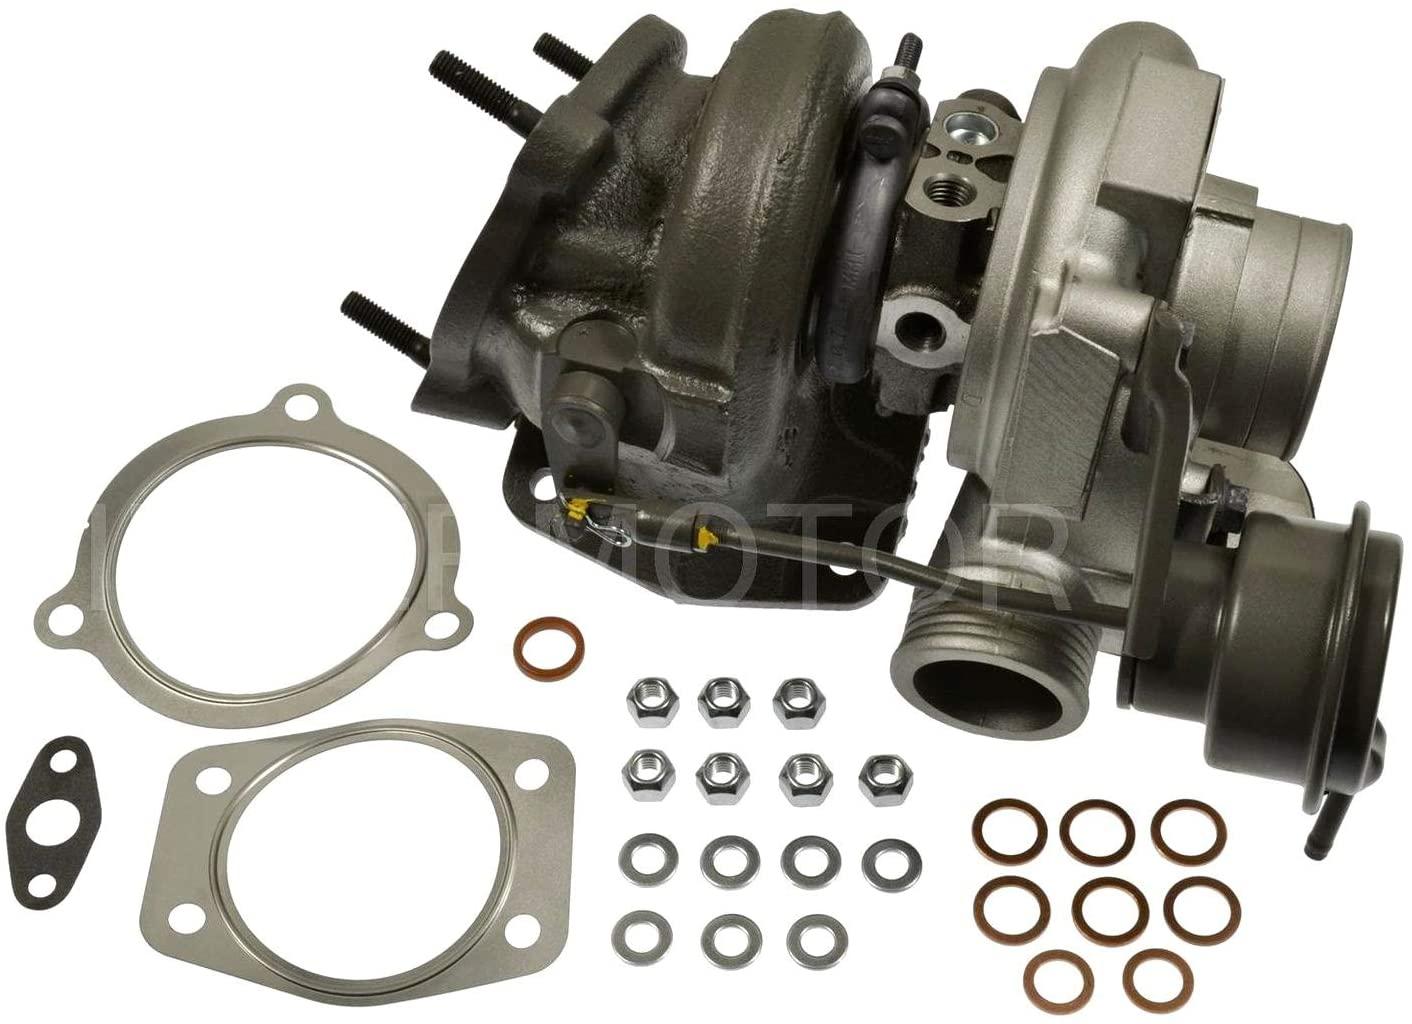 Standard - Intermotor Remanufactured Turbocharger